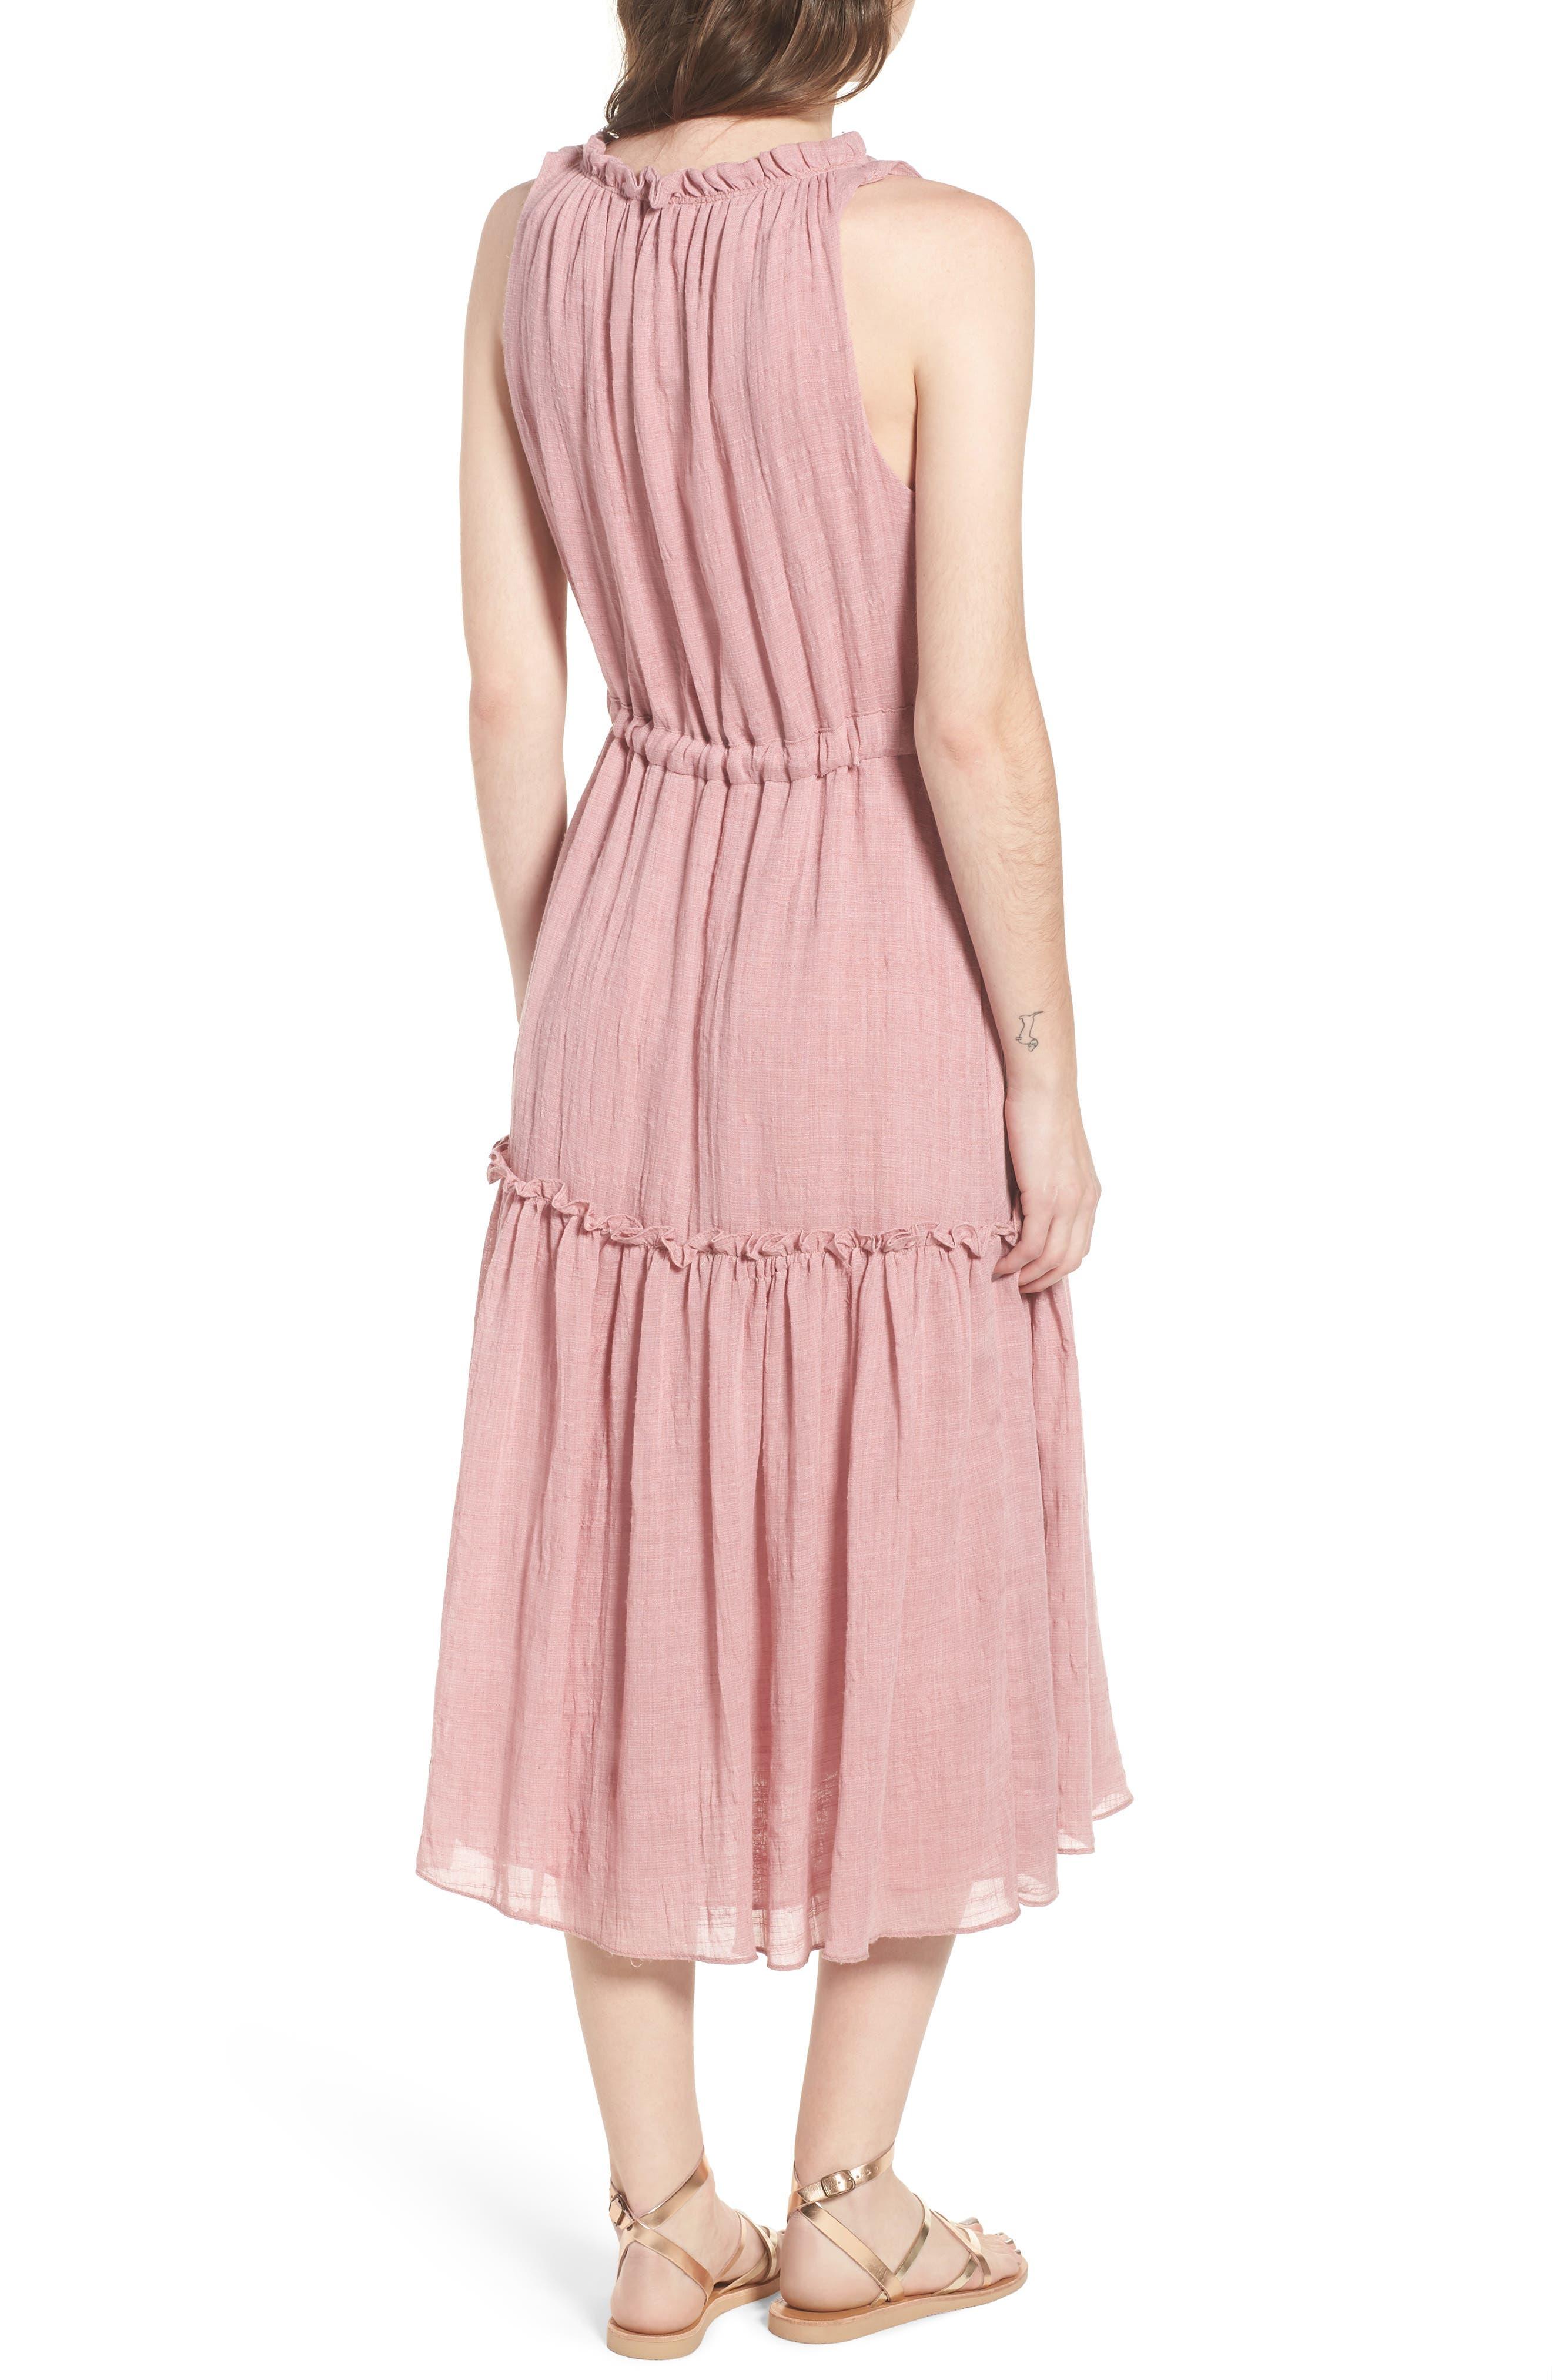 Nicolleta Tie Waist Midi Dress,                             Alternate thumbnail 2, color,                             Dusty Pink